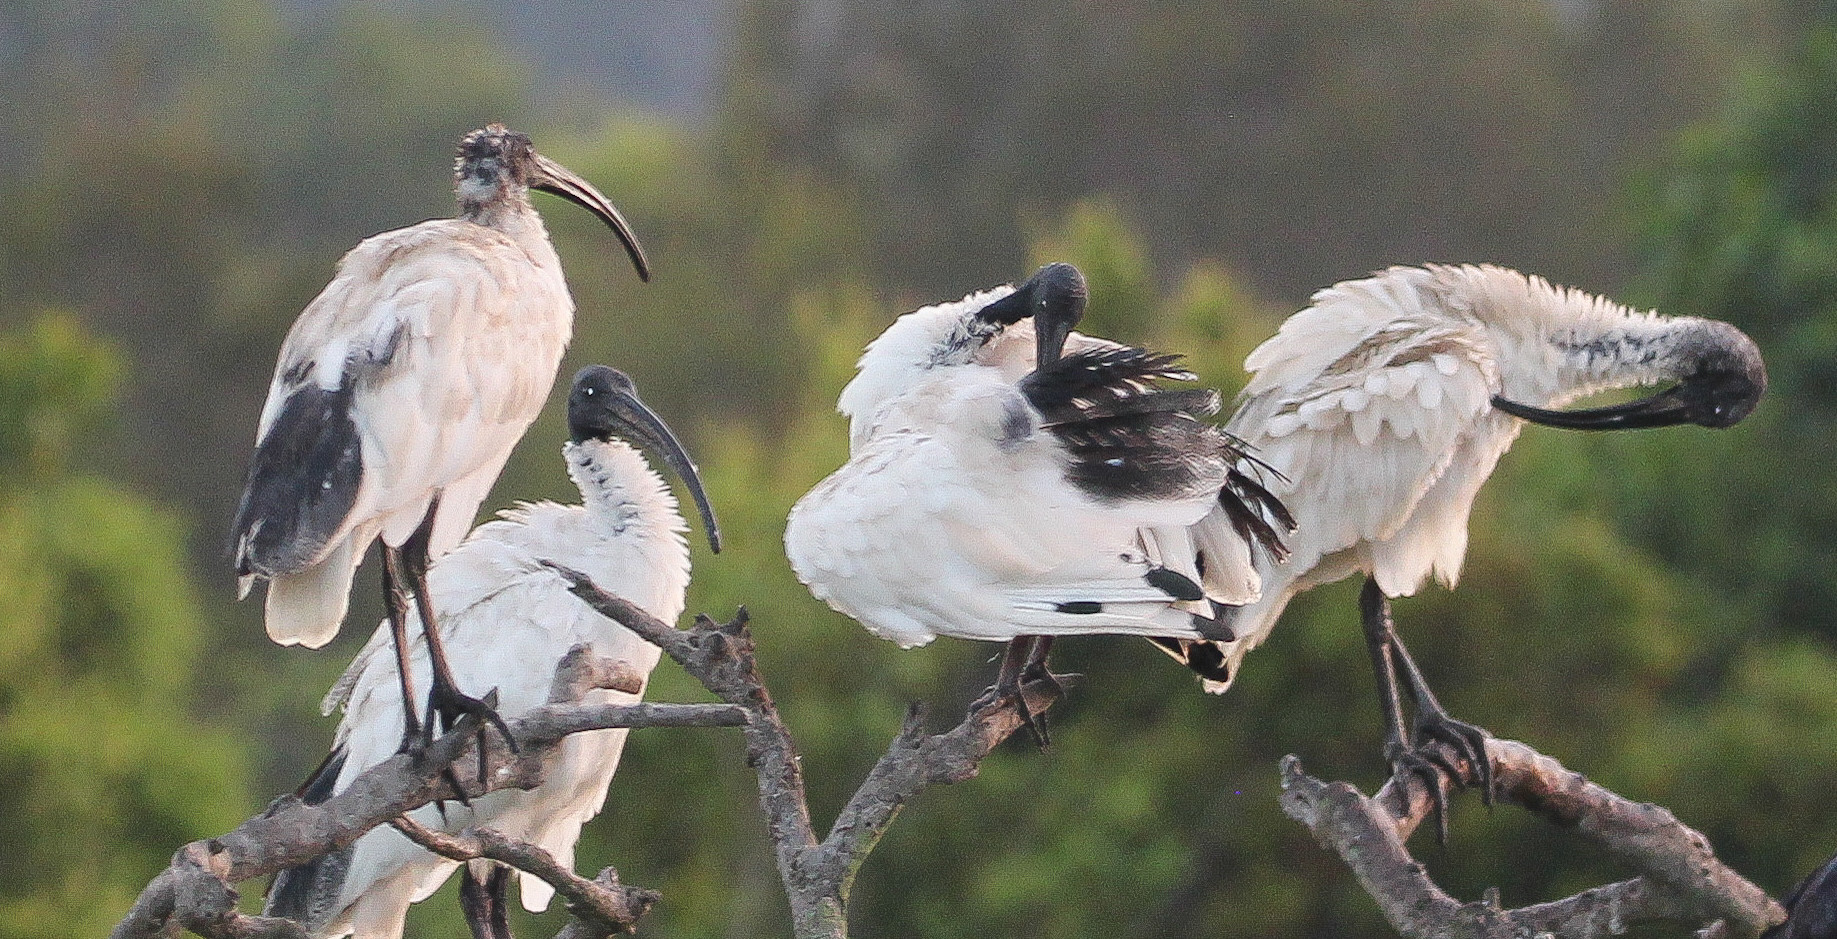 Australian White Ibis preening